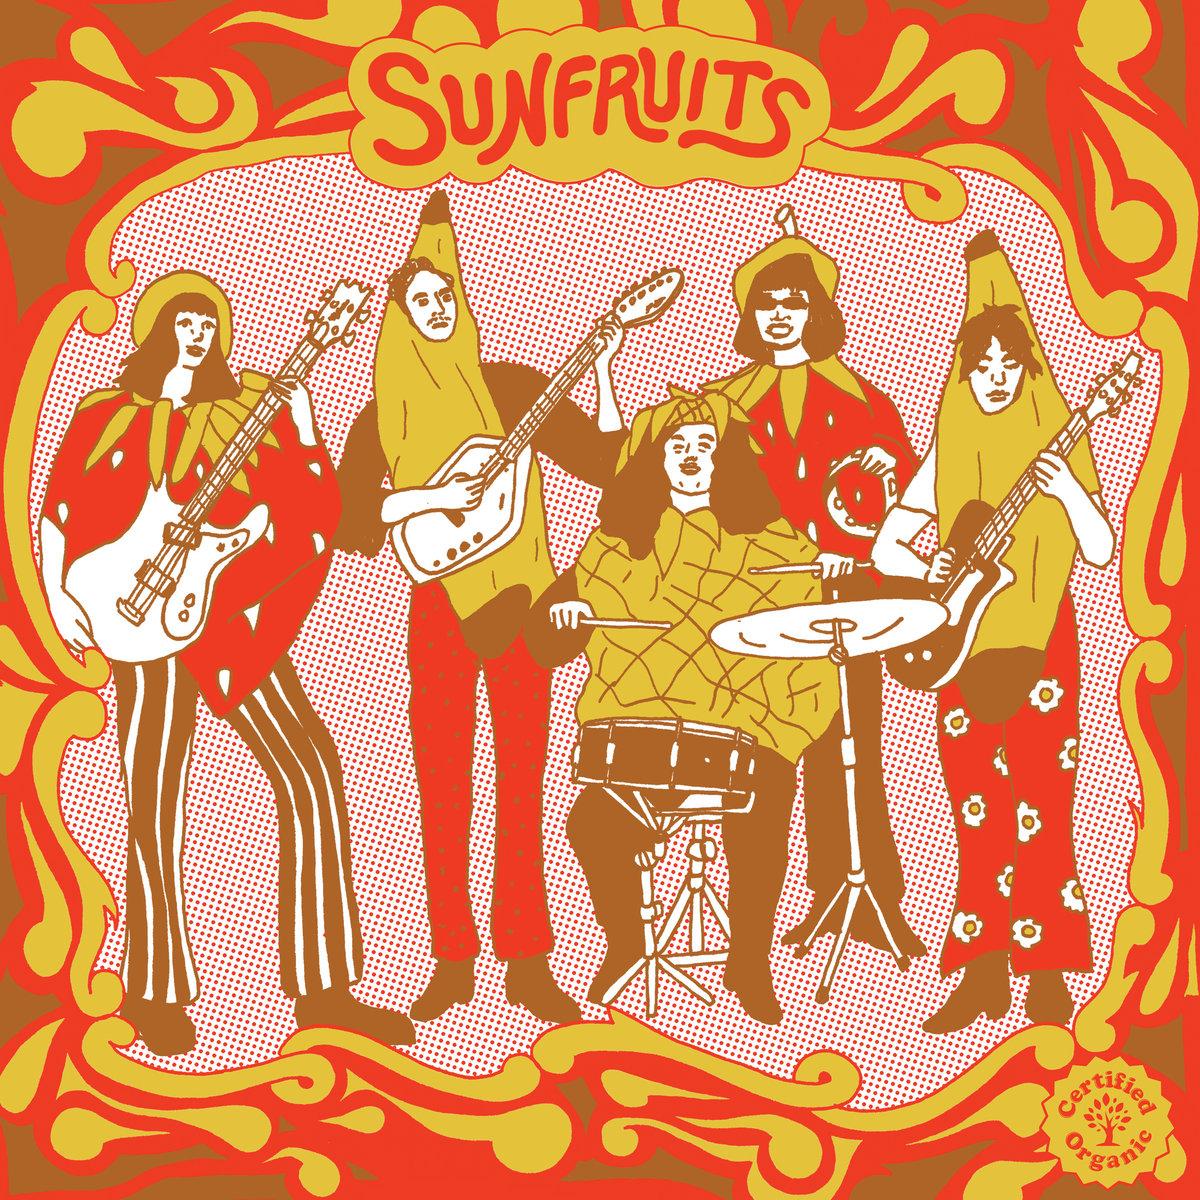 Sunfruits - Certified Organic